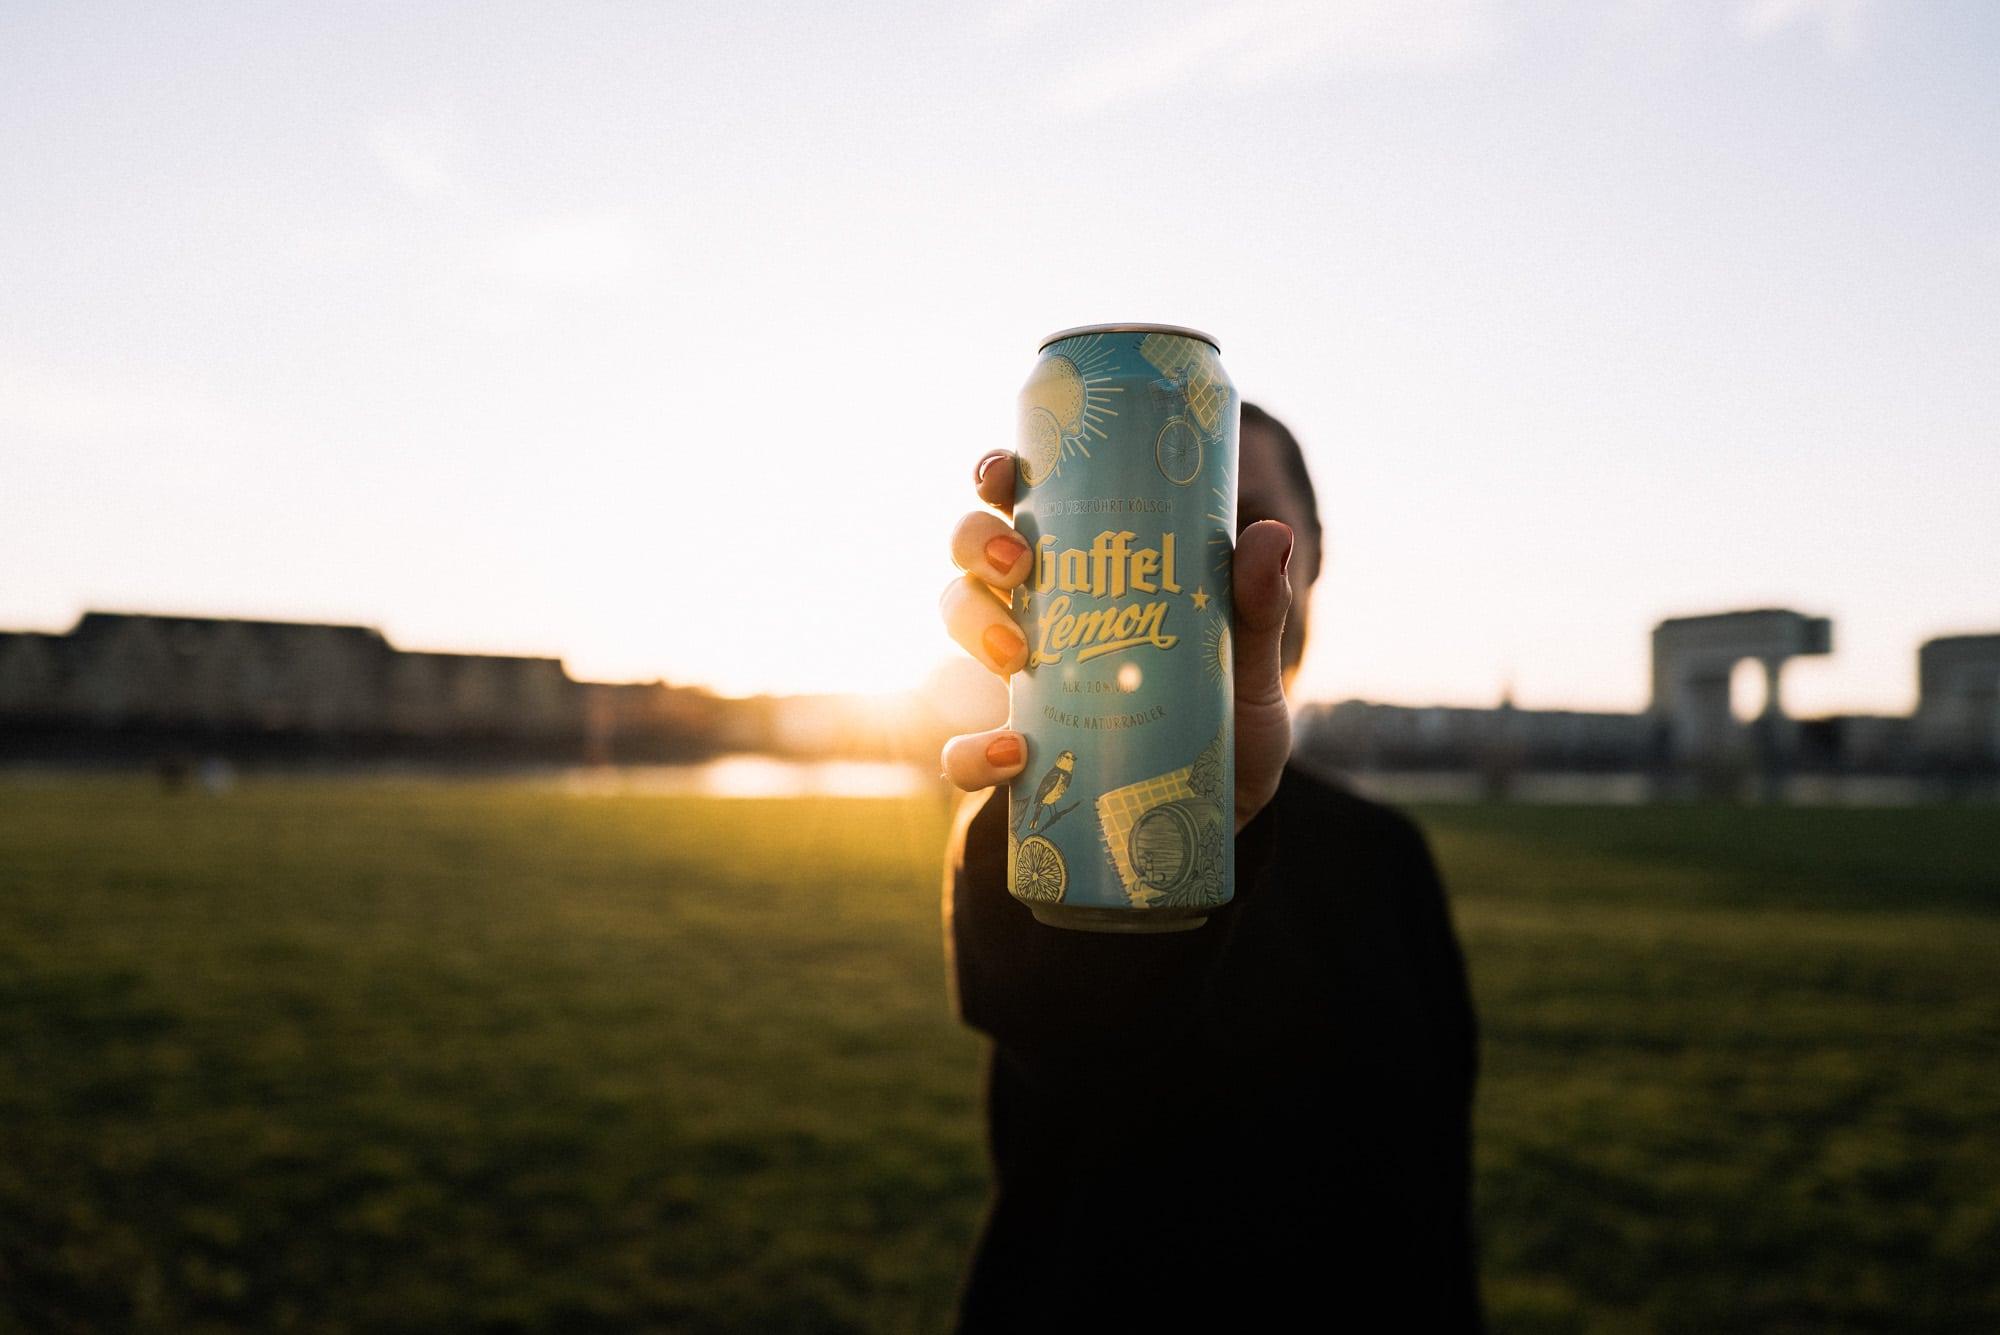 Neuer Gaffel Lemon Image-Clip